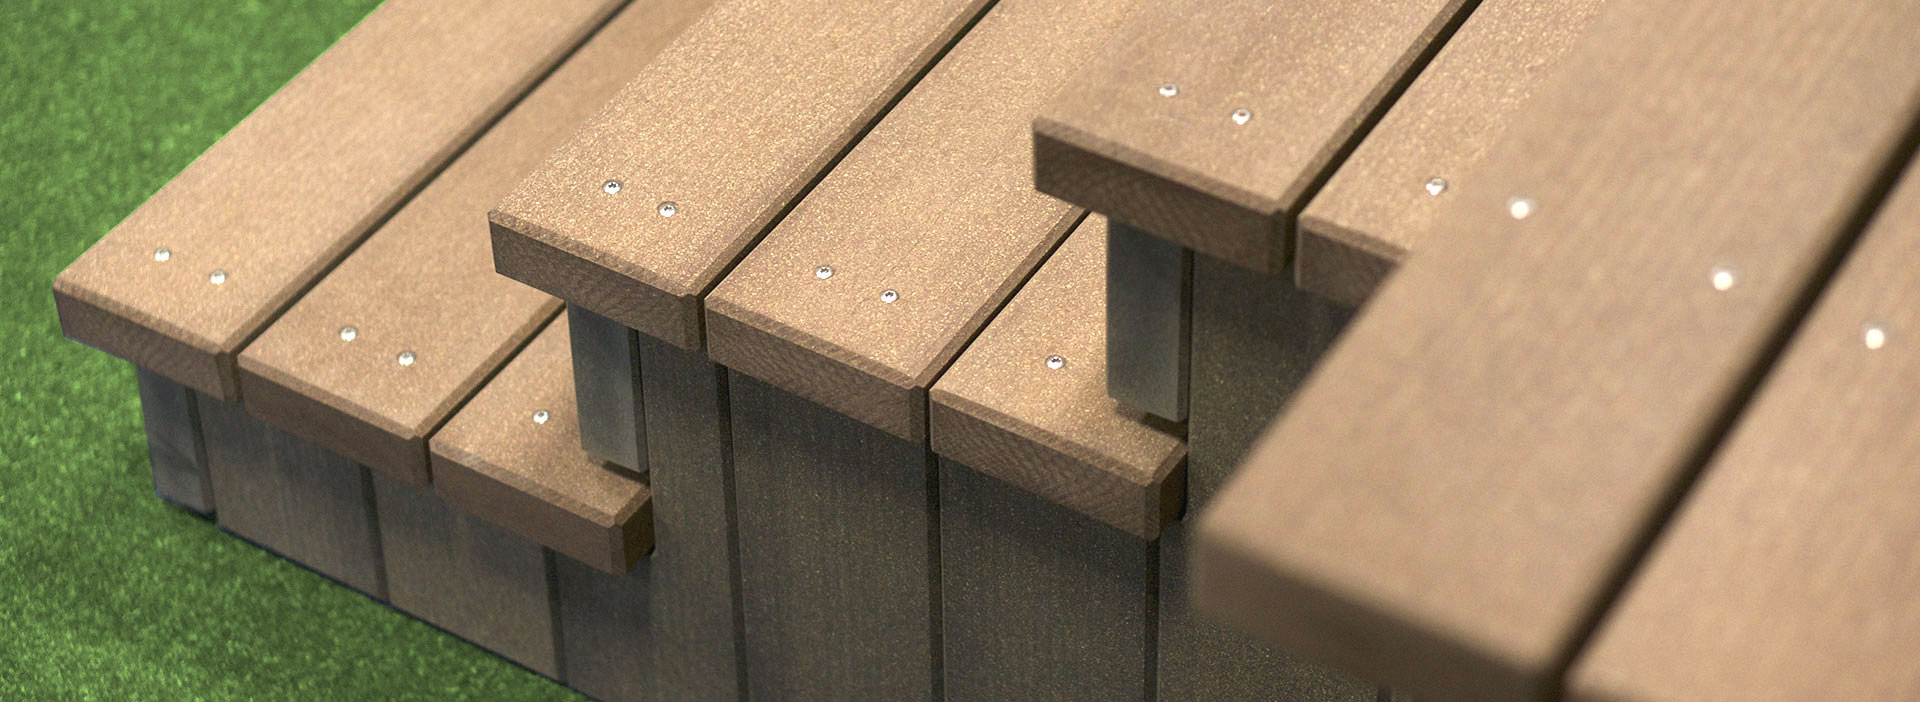 Megawood Terrassensystem Treppe